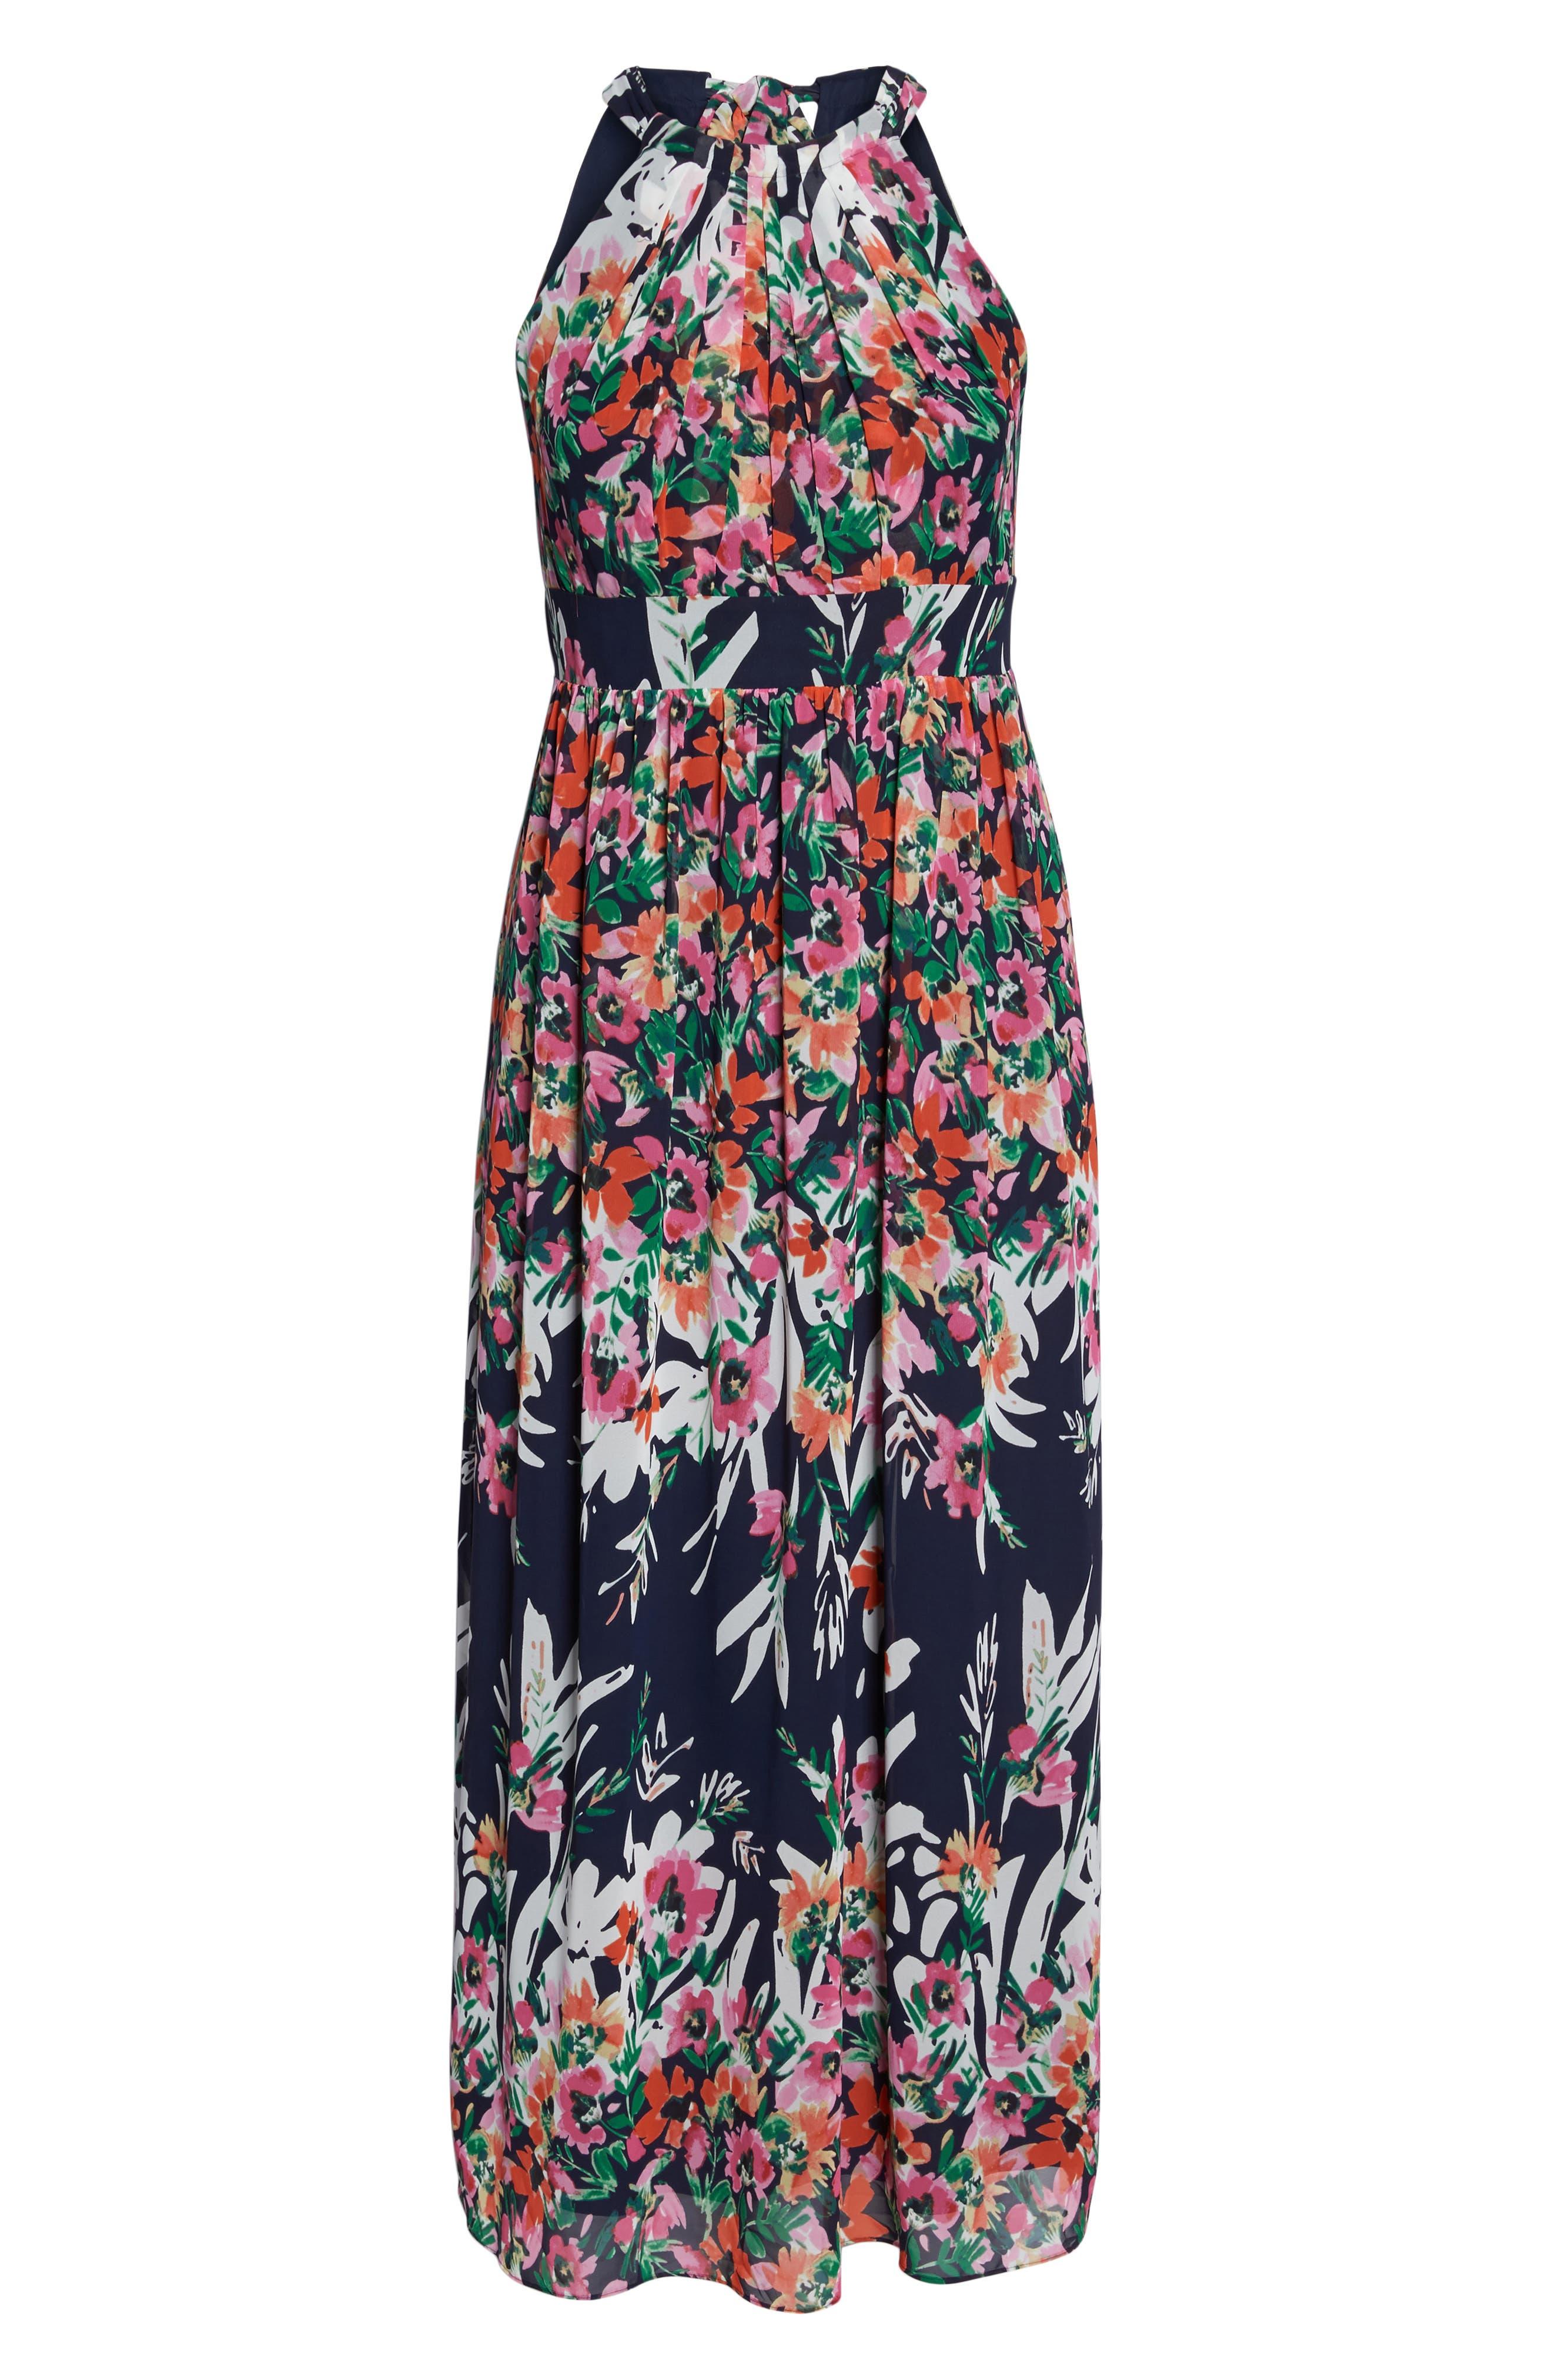 Floral Halter Chiffon Maxi Dress,                             Alternate thumbnail 7, color,                             NAVY/ PINK